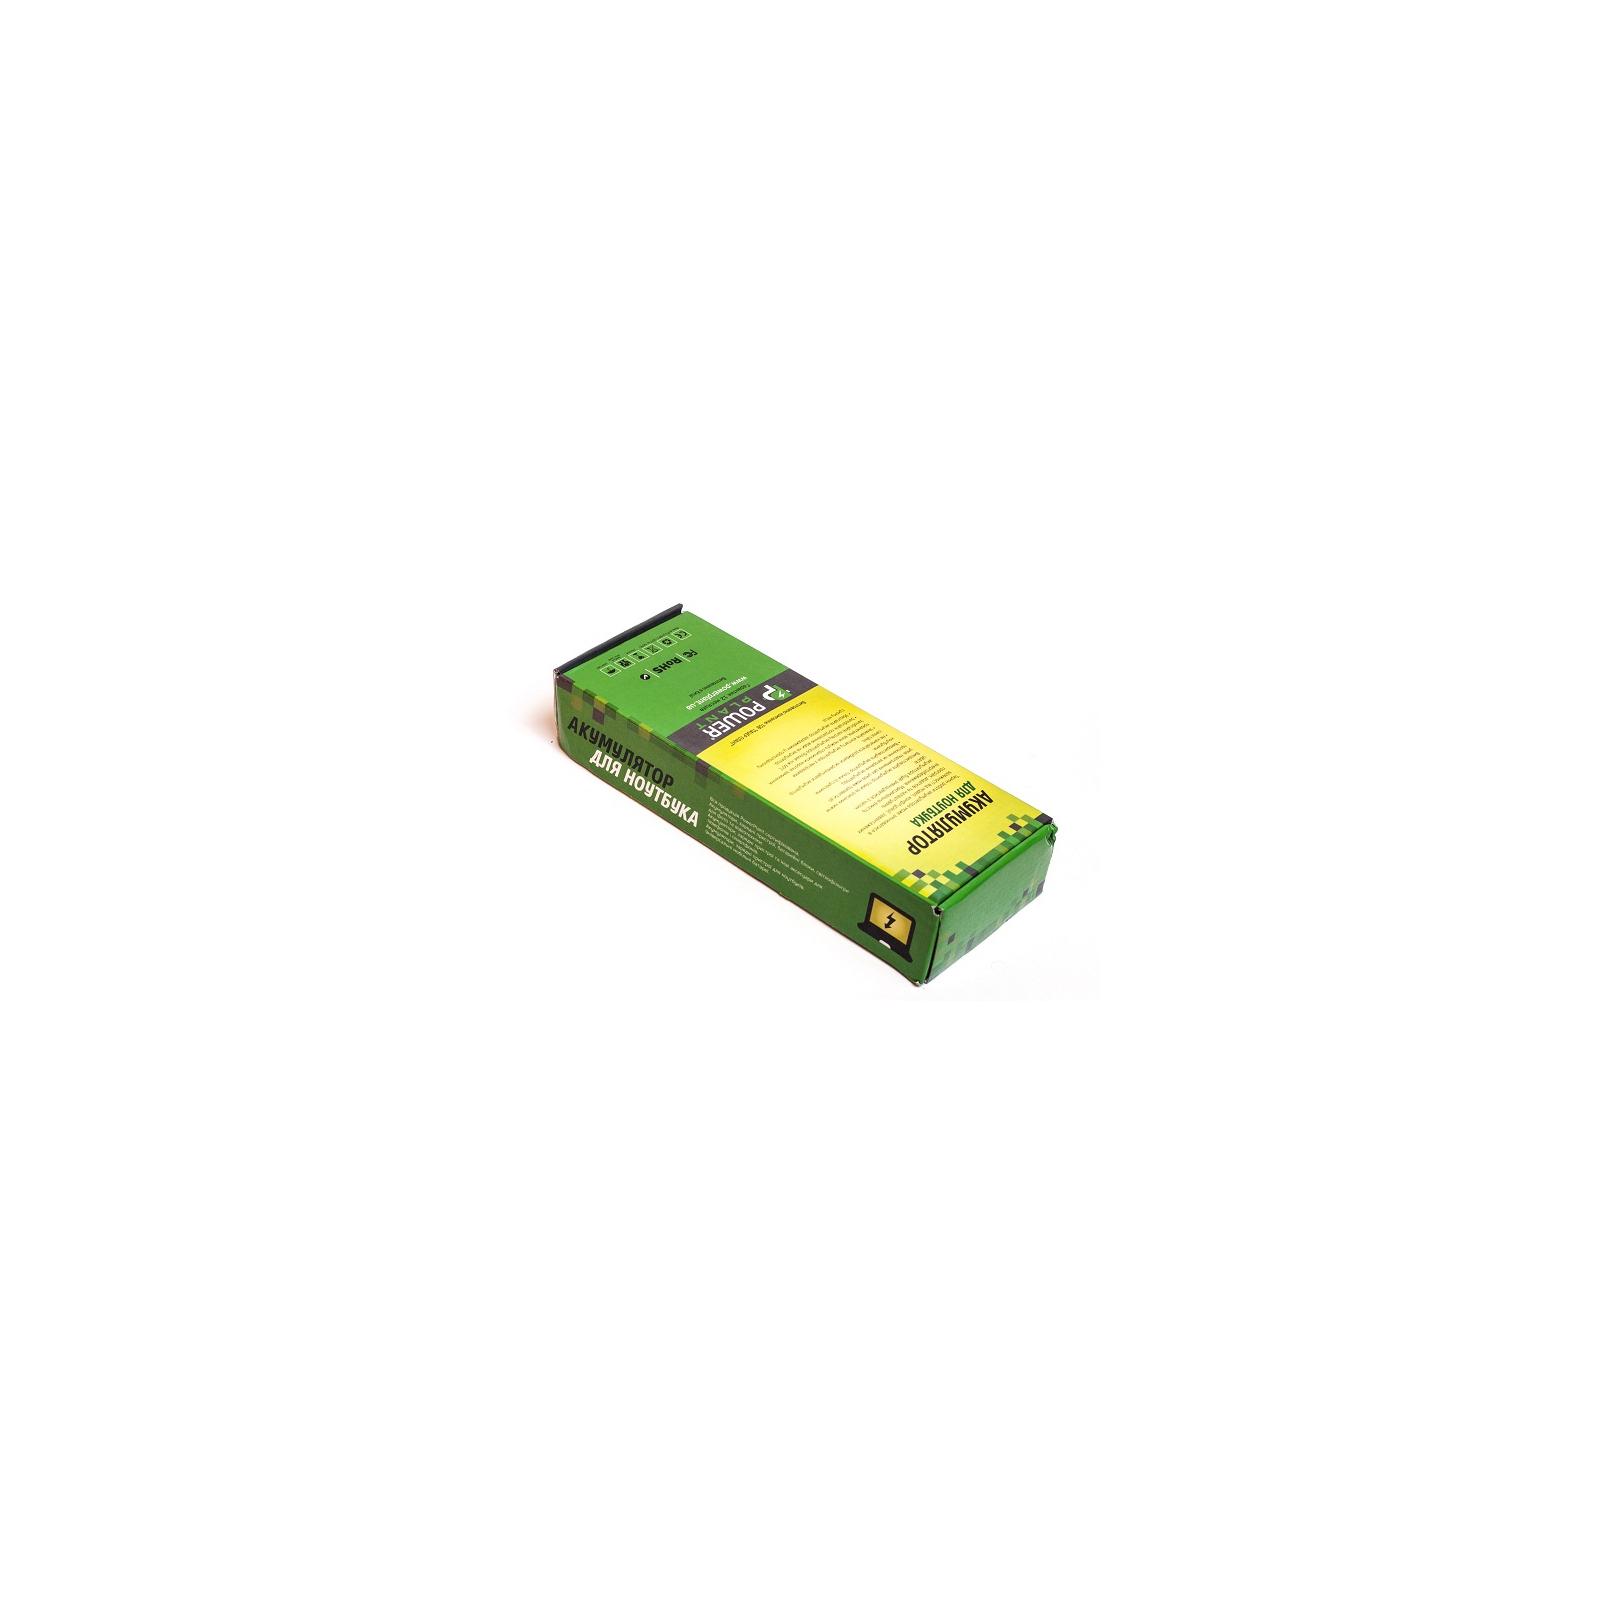 Аккумулятор для ноутбука HP Presario V3000 (HSTNN-DB42, H DV2000 3S2P) 10.8V 5200mAh PowerPlant (NB00000019) изображение 2